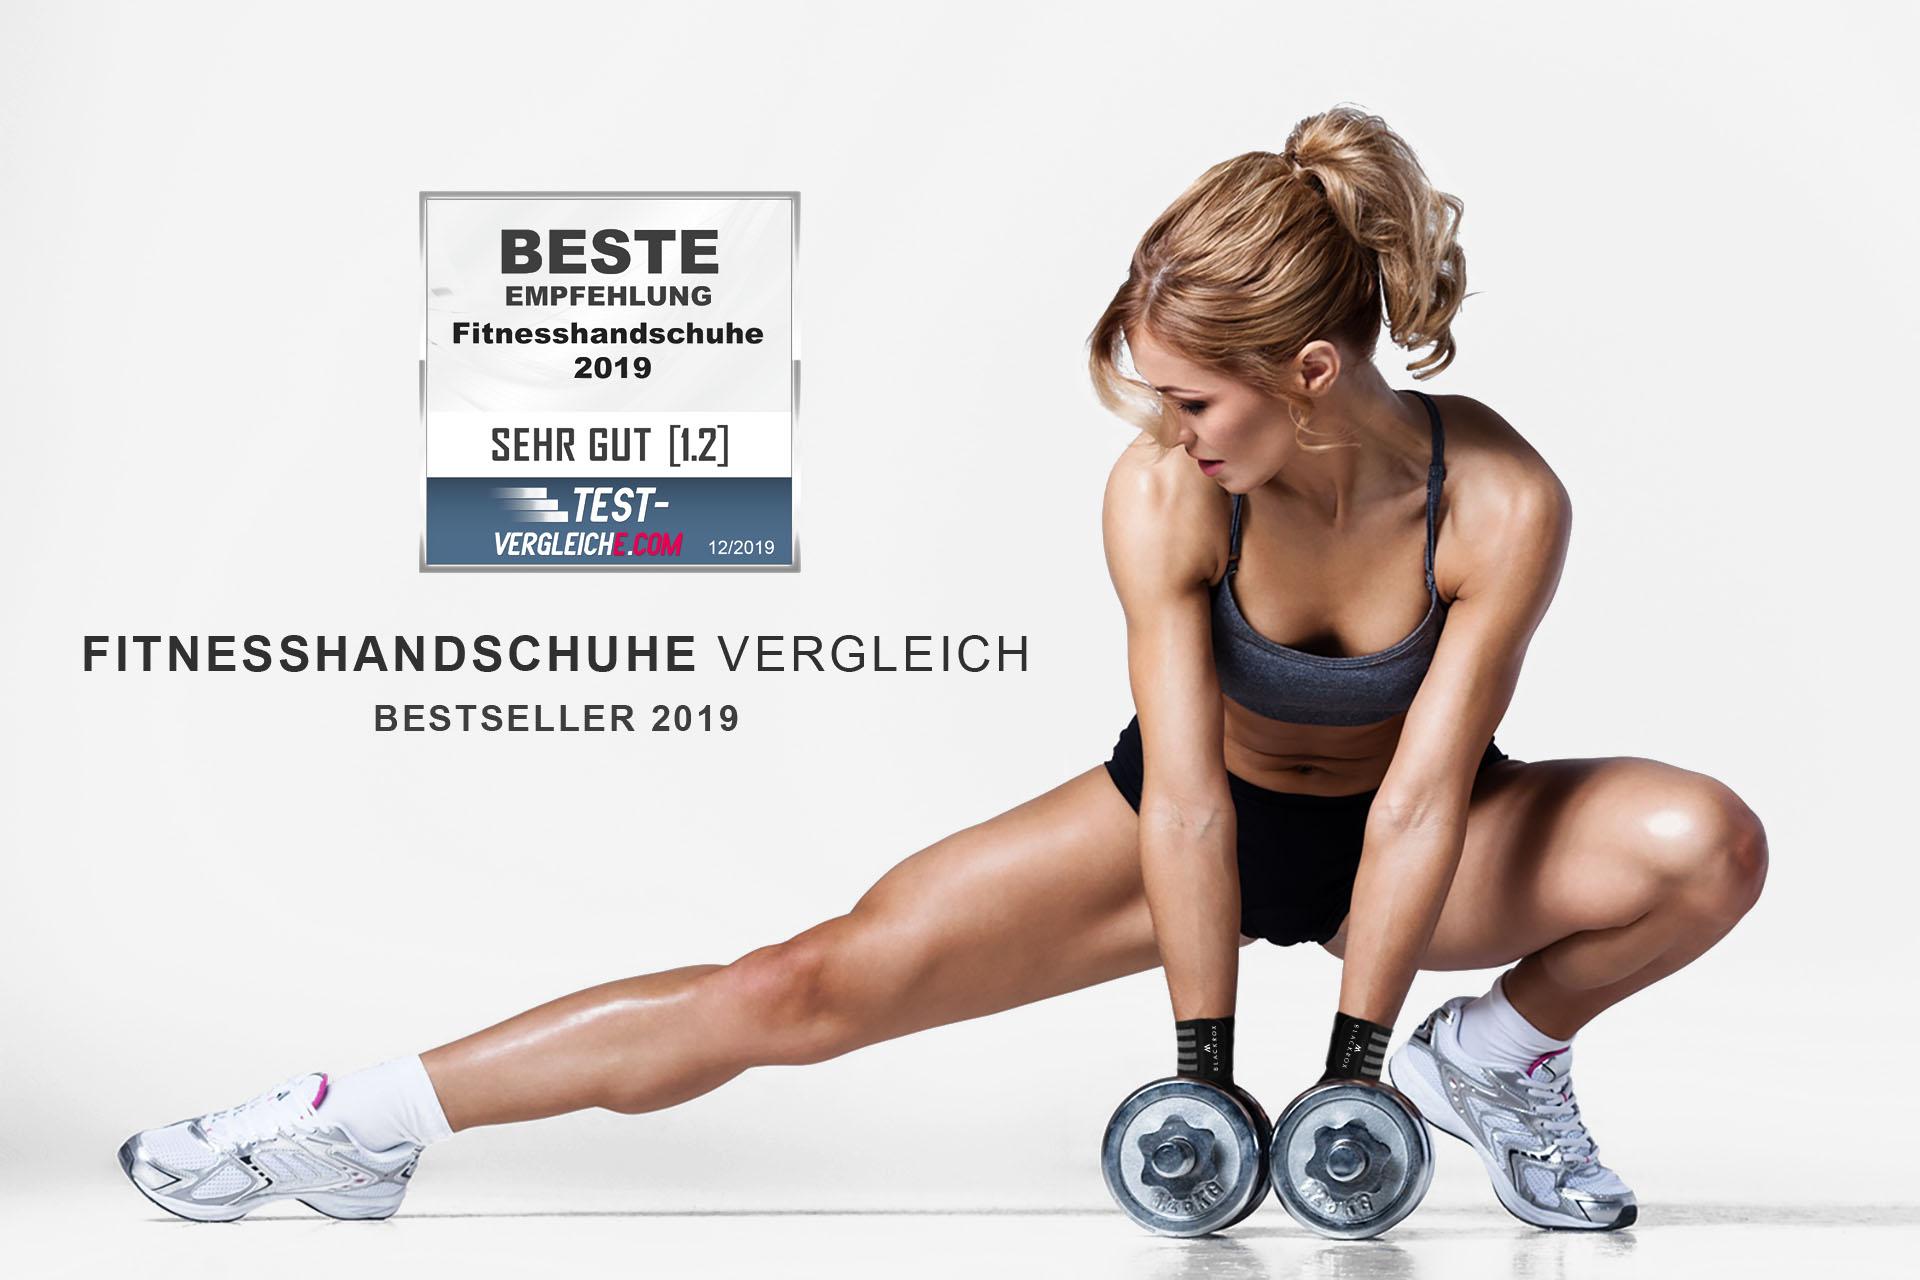 Fitnesshandschuhe-test-vergleiche